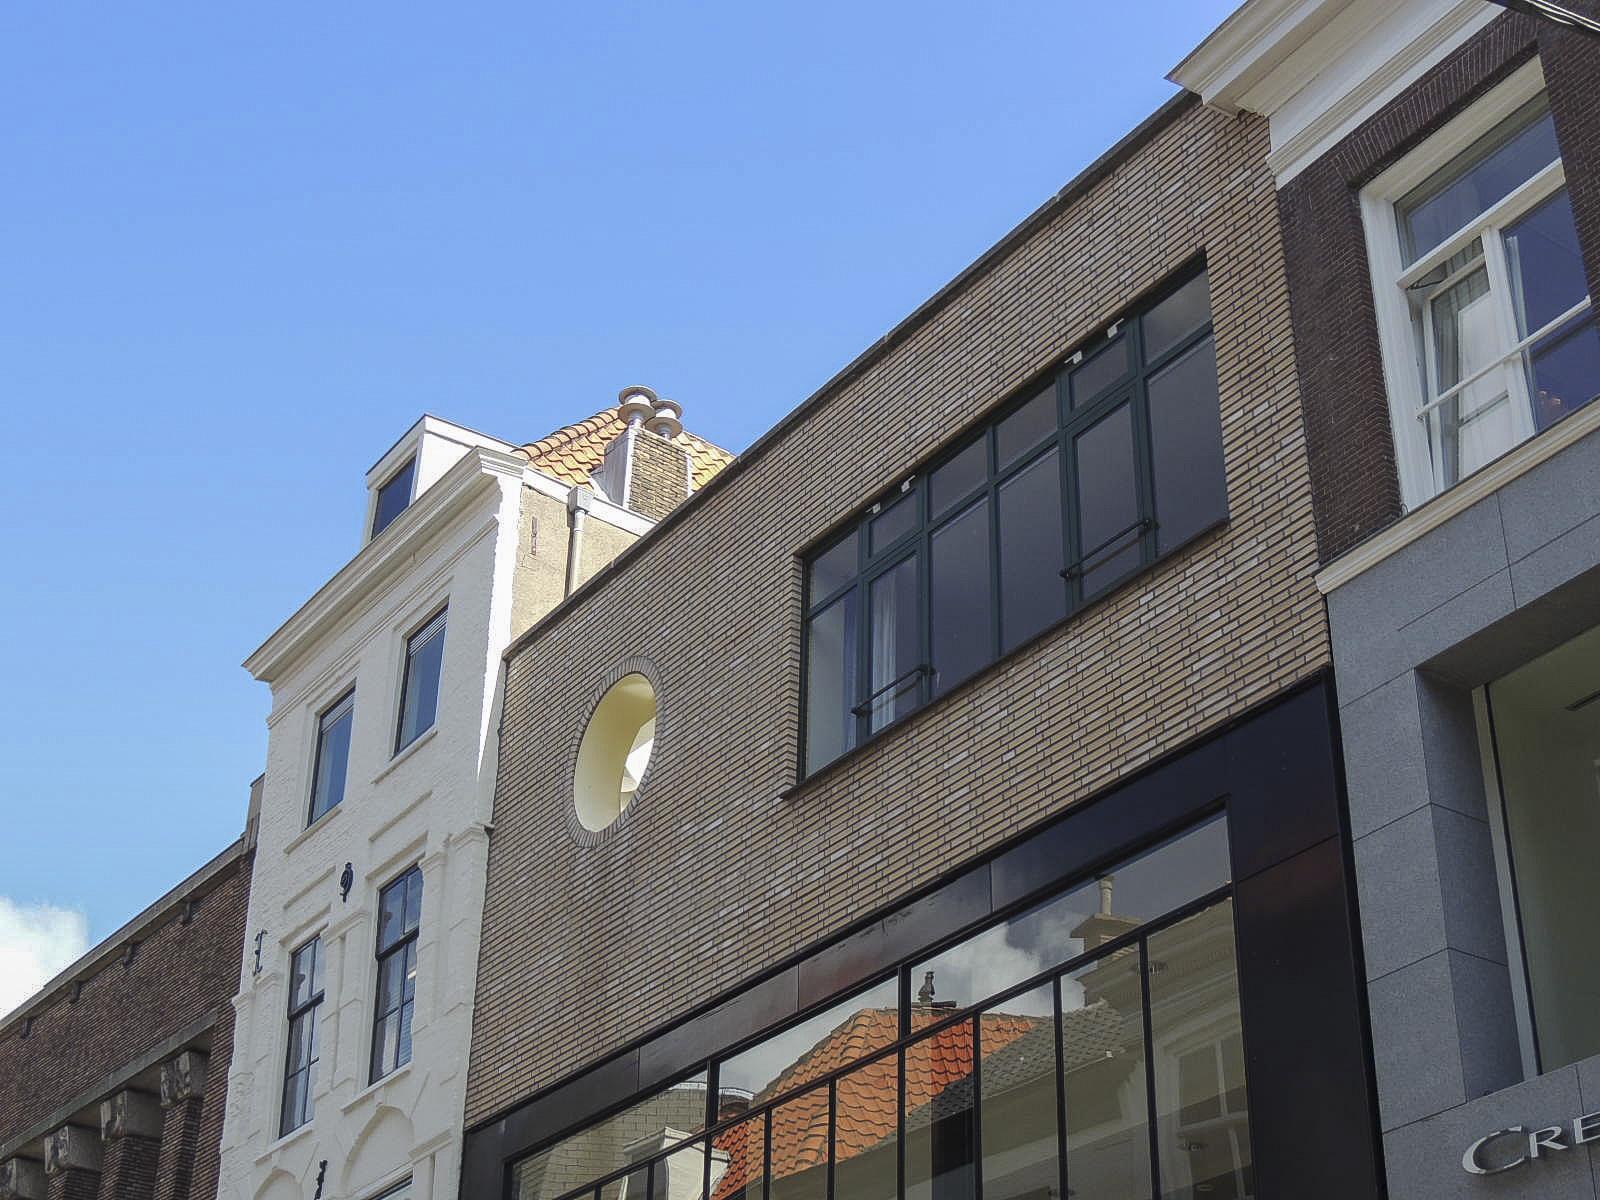 Buitenhof 2 bedroom apartment, The Hague